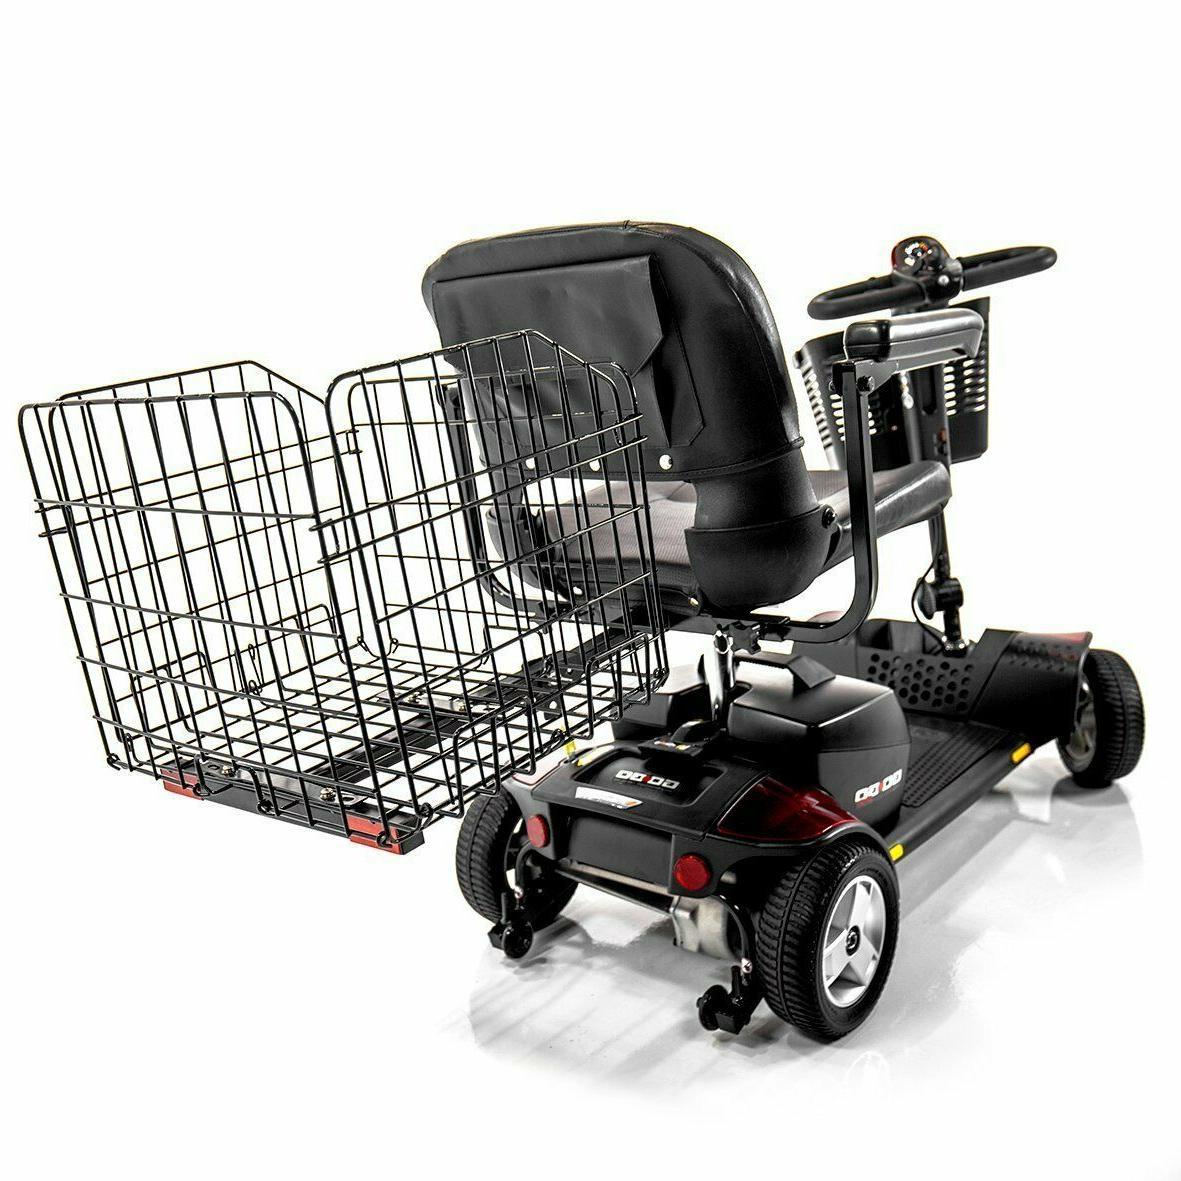 j950 folding rear basket for pride mobility